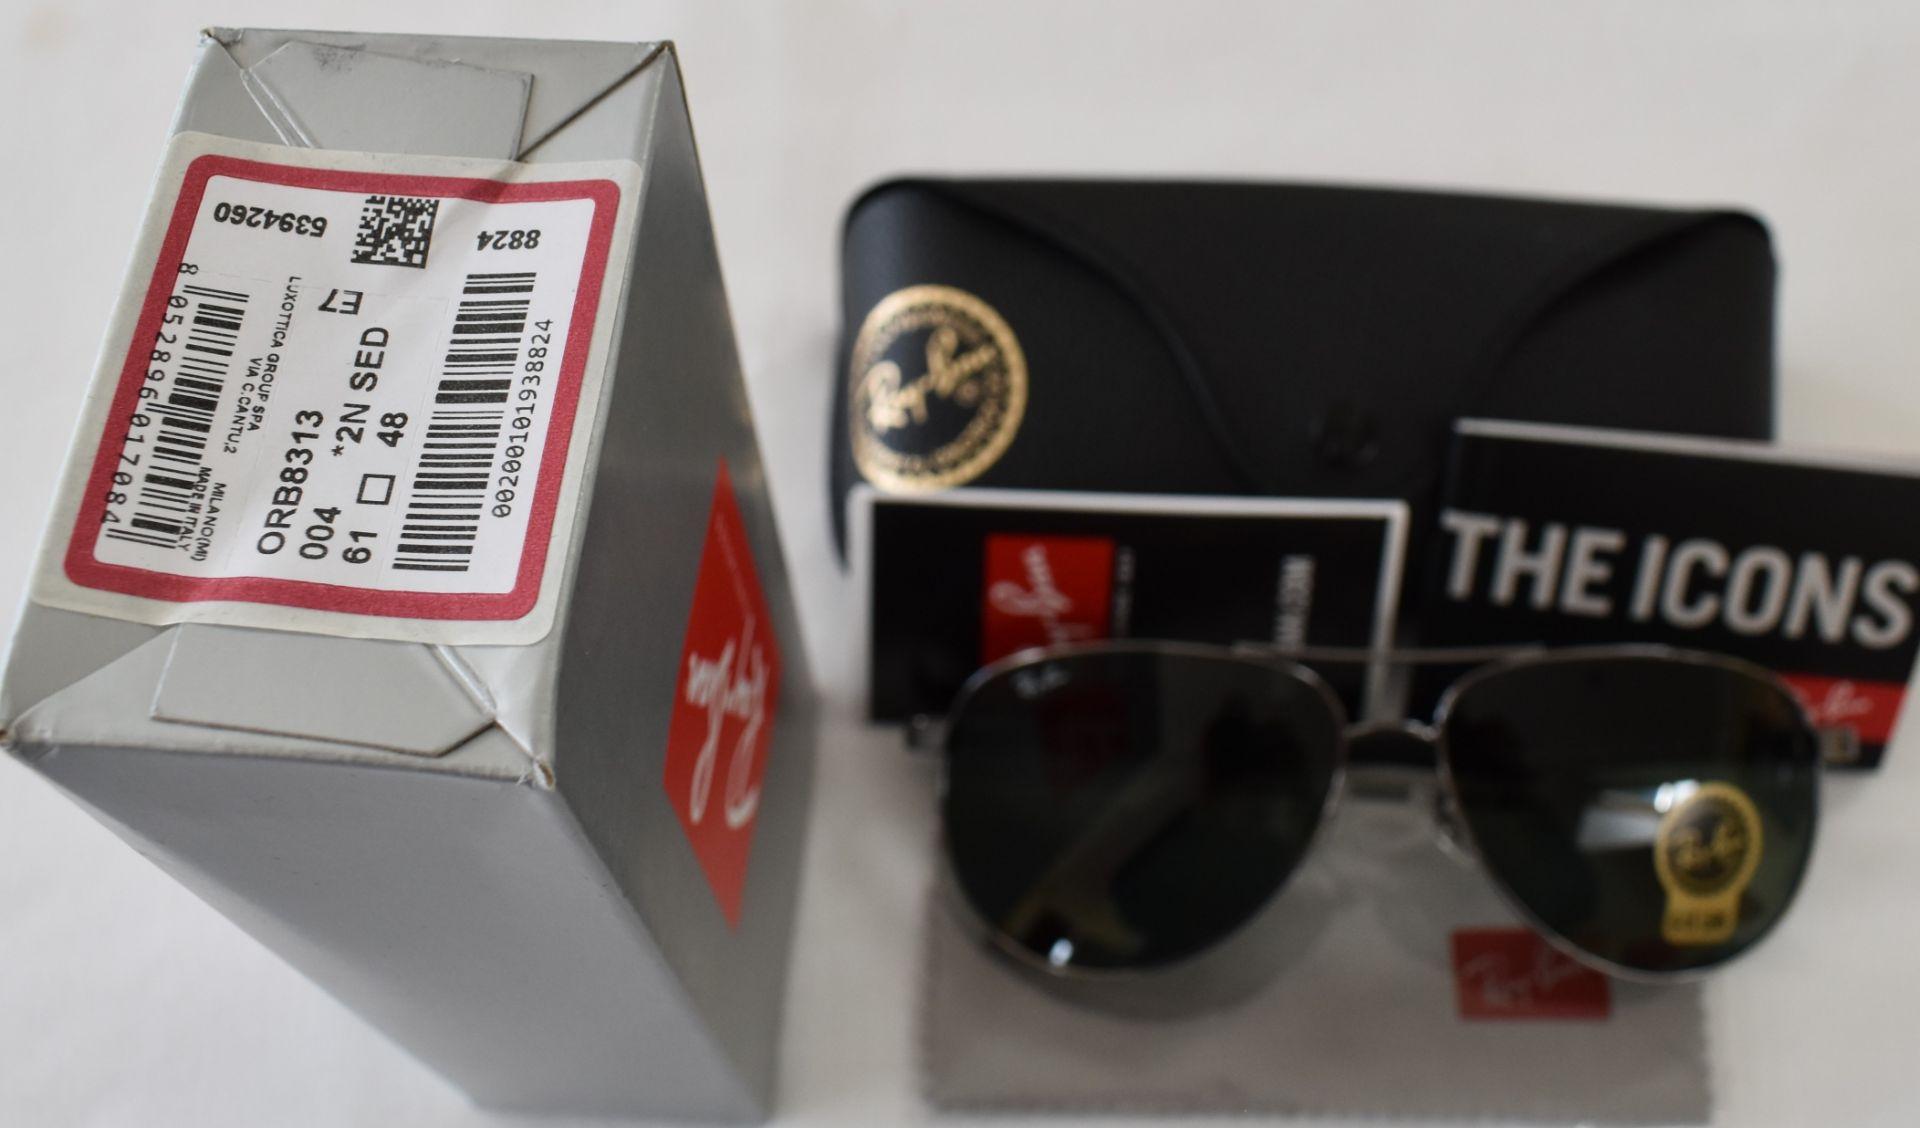 Ray Ban Sunglasses ORB8313 004 *2N - Image 3 of 3